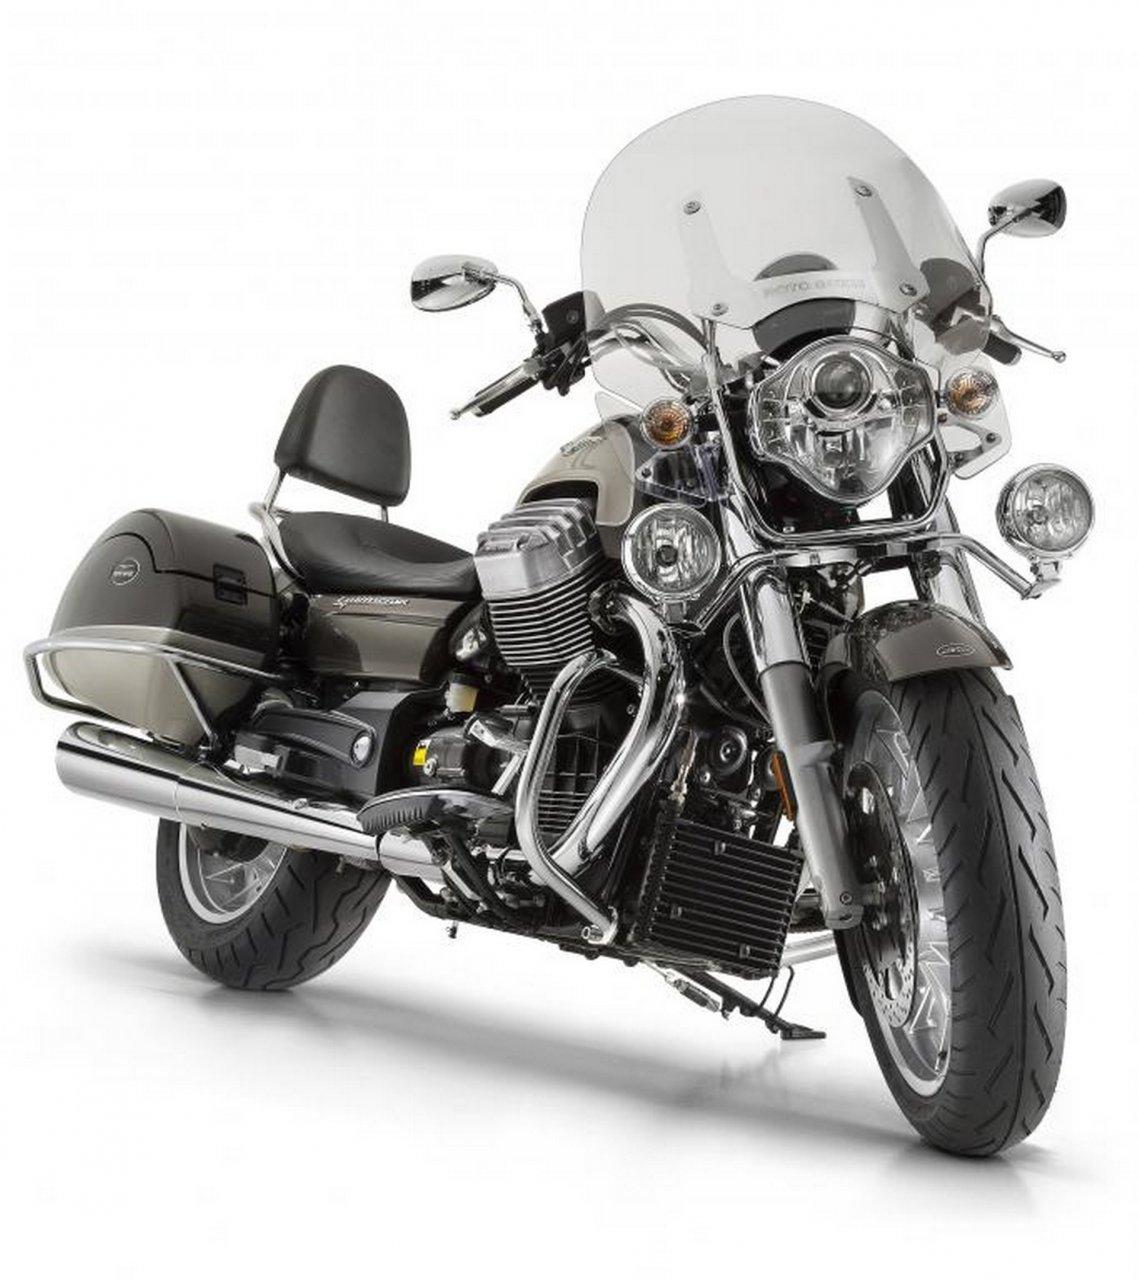 Moto Guzzi California Touring 1400 7